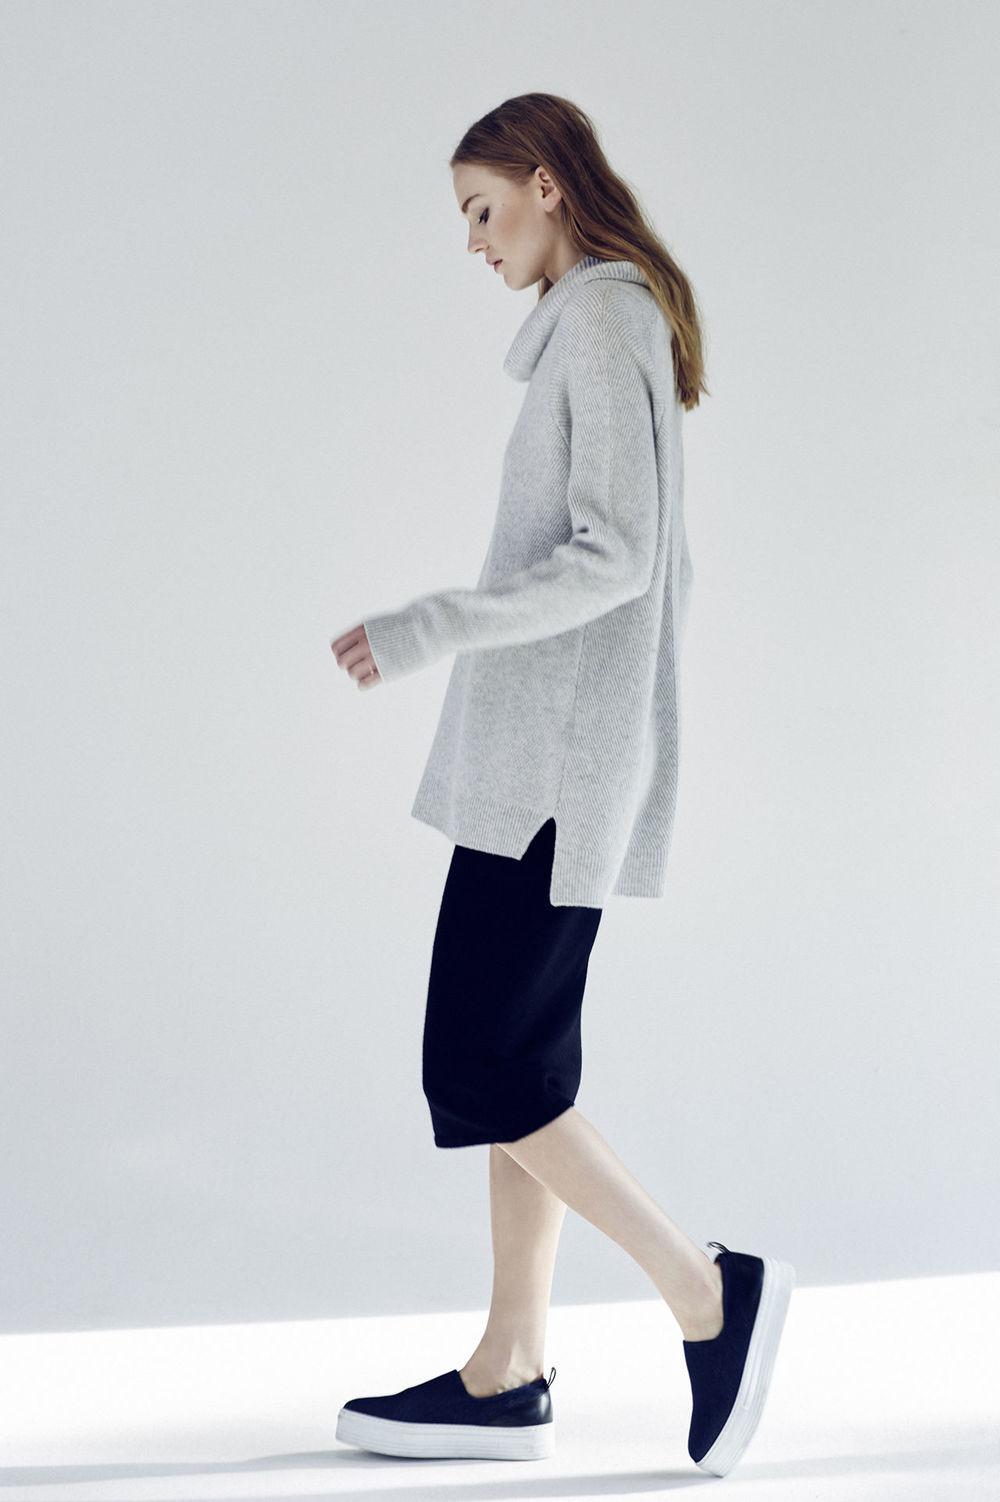 whistles_knitwear_aw14_07-1_004fe780500784.jpg